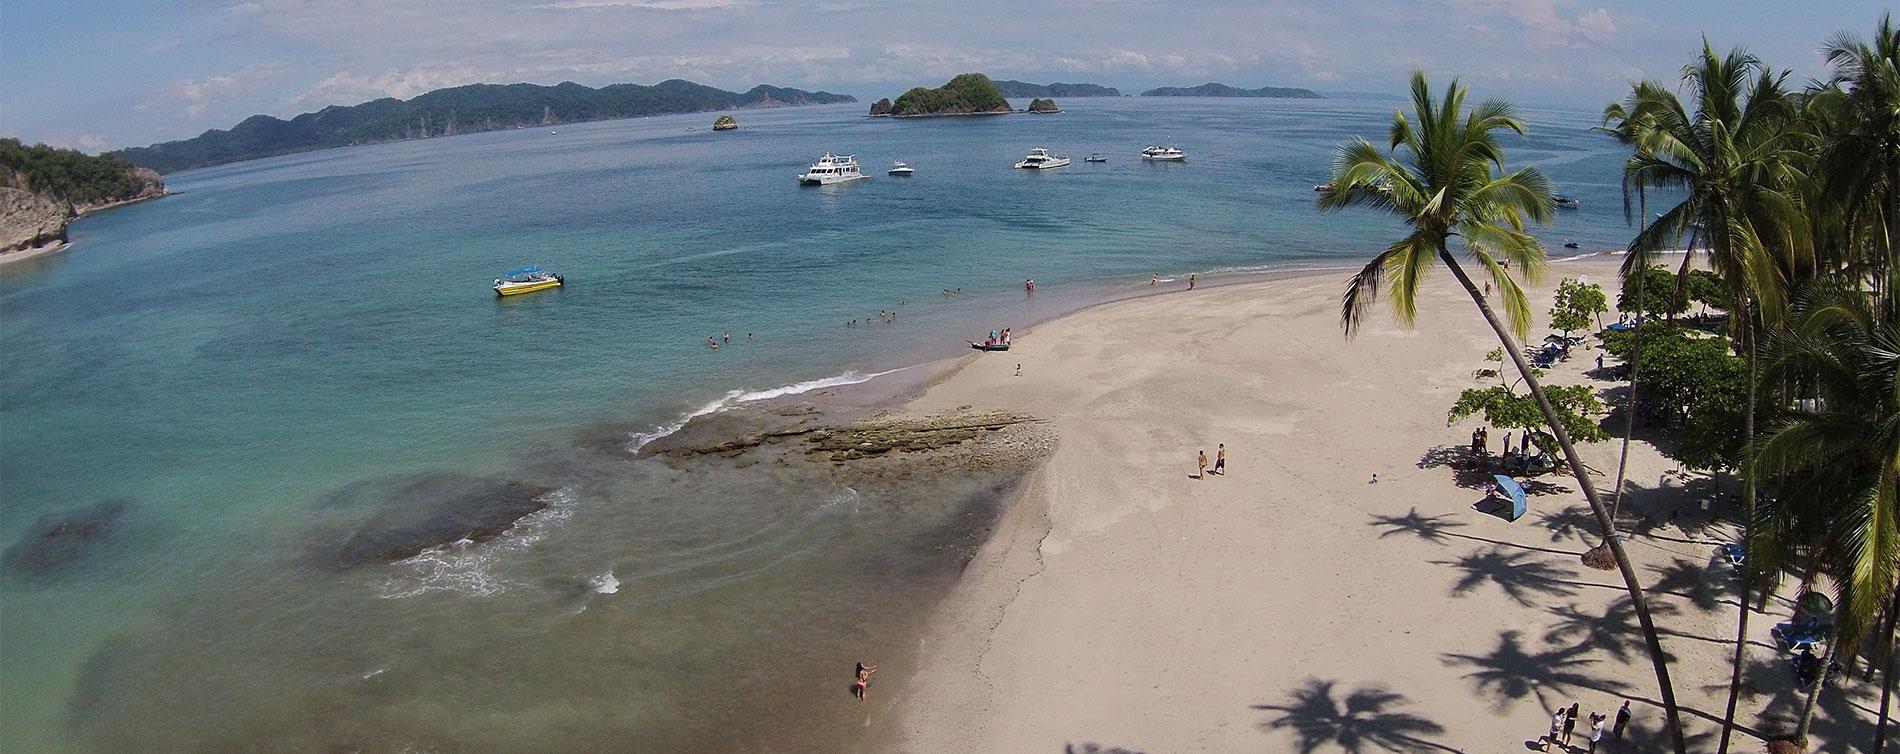 Tortuga Island Tours - Zuma Tours